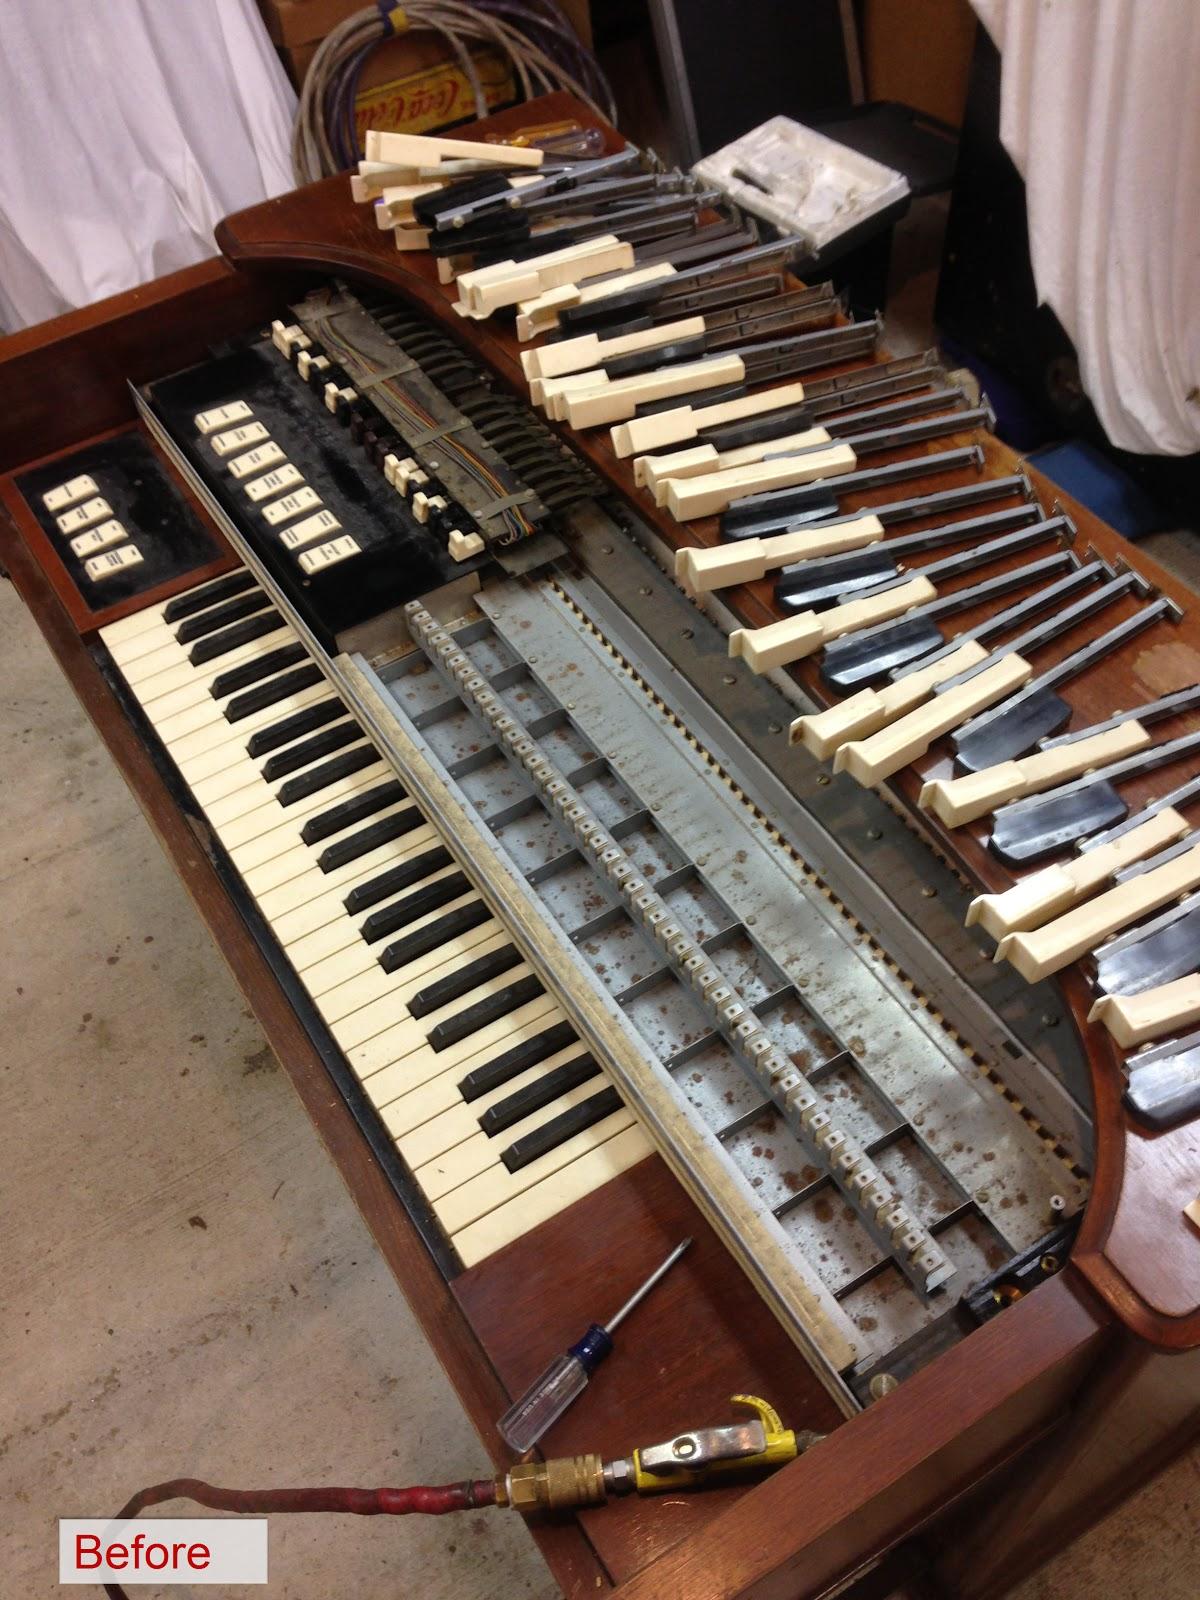 Music From Marshall: Hammond M3 Organ Restoration on tube organ schematic, vibrolux reverb schematic, hammond m2, leslie 147 schematic, guitar rectifier schematic, yamaha organ schematic, kustom bass amp schematic, leslie 122 schematic, kustom 100 schematic, peavey combo 300 schematic, fender jazz bass schematic, 6au6 preamp schematic, kustom preamp schematic, hammond cv preamp, hammond transformer wiring diagrams, grid tie inverter schematic, wurlitzer organ schematic, 145 leslie preamp schematic,